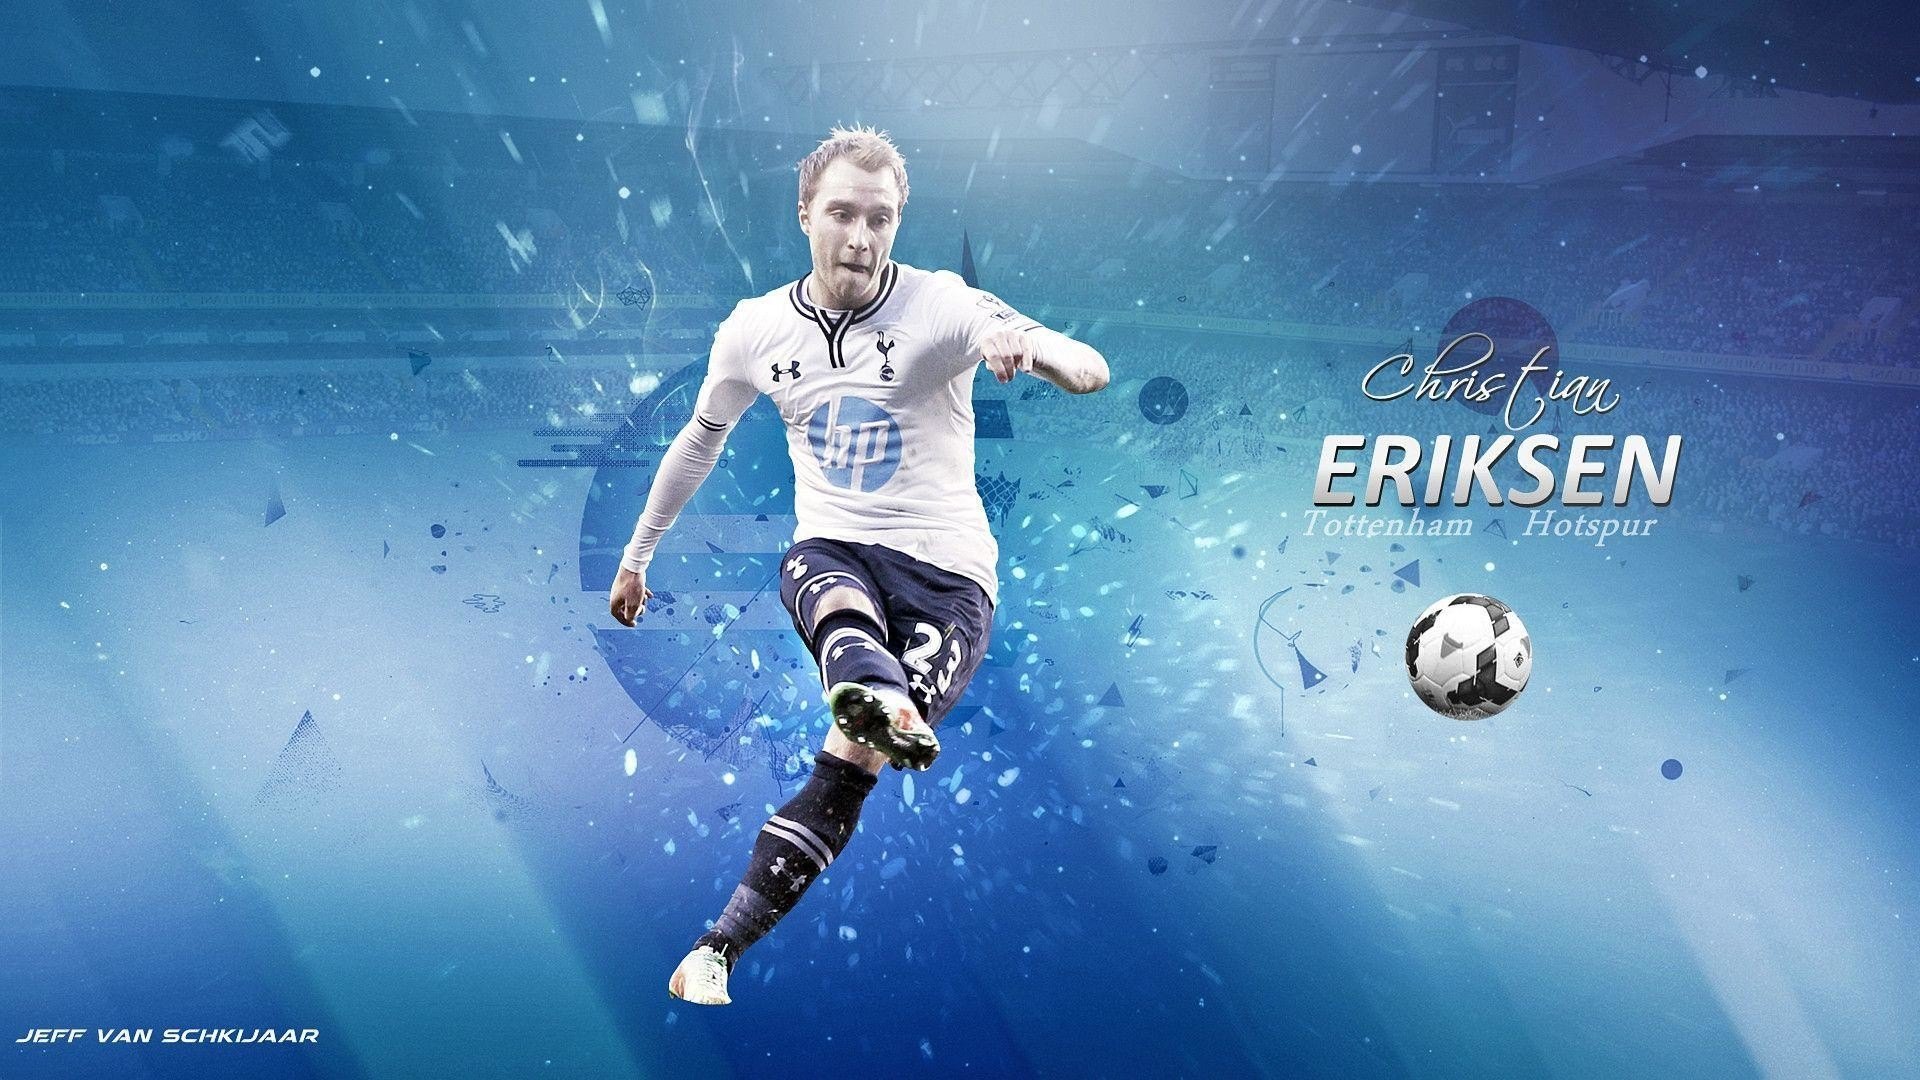 Christian Eriksen Tottenham Hotspur Wallpaper by jeffery10 on .